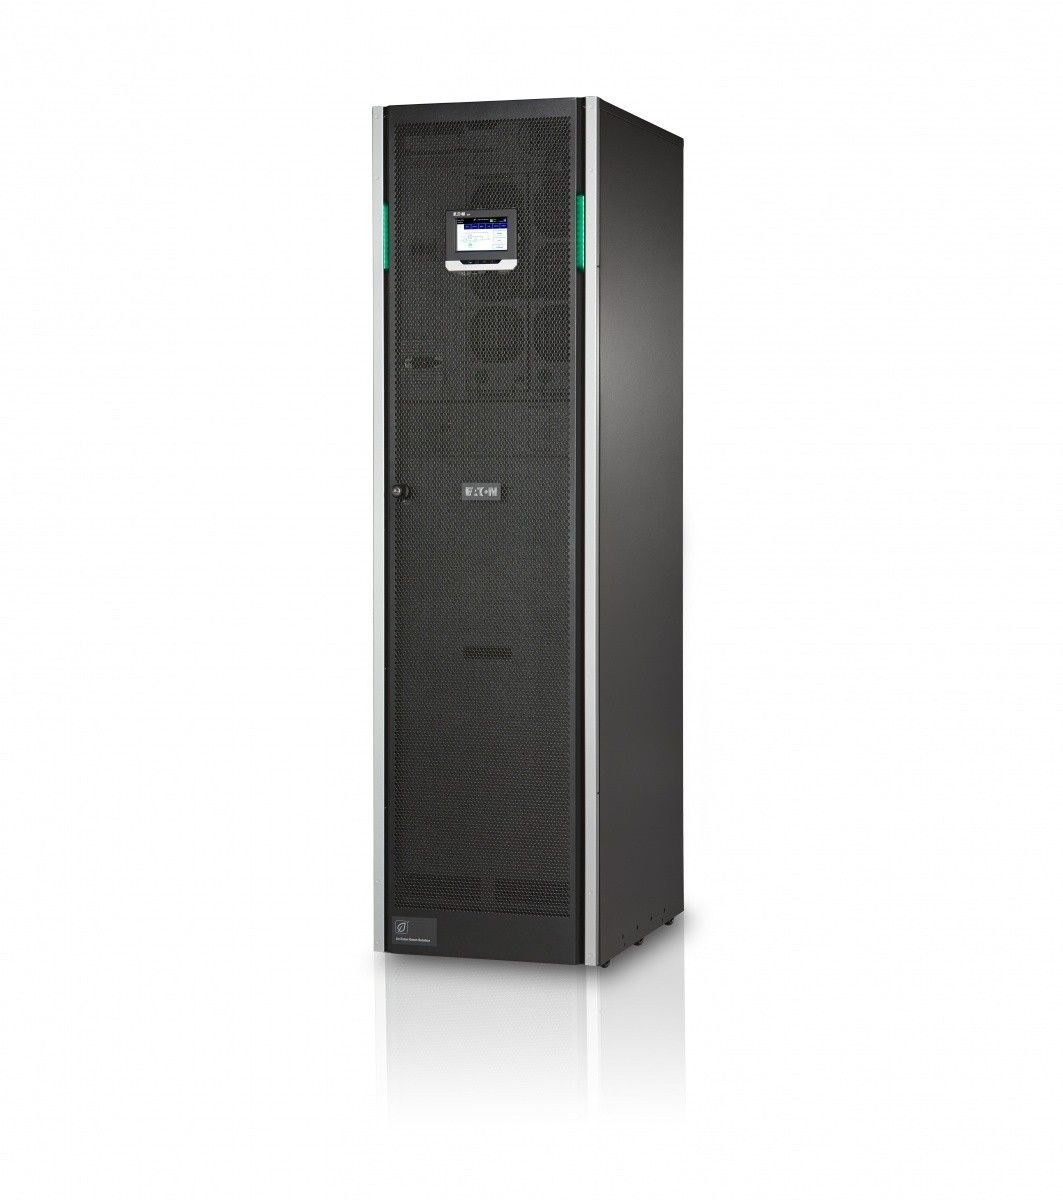 Eaton UPS 93PS-40(40)-40-0-MBS-6